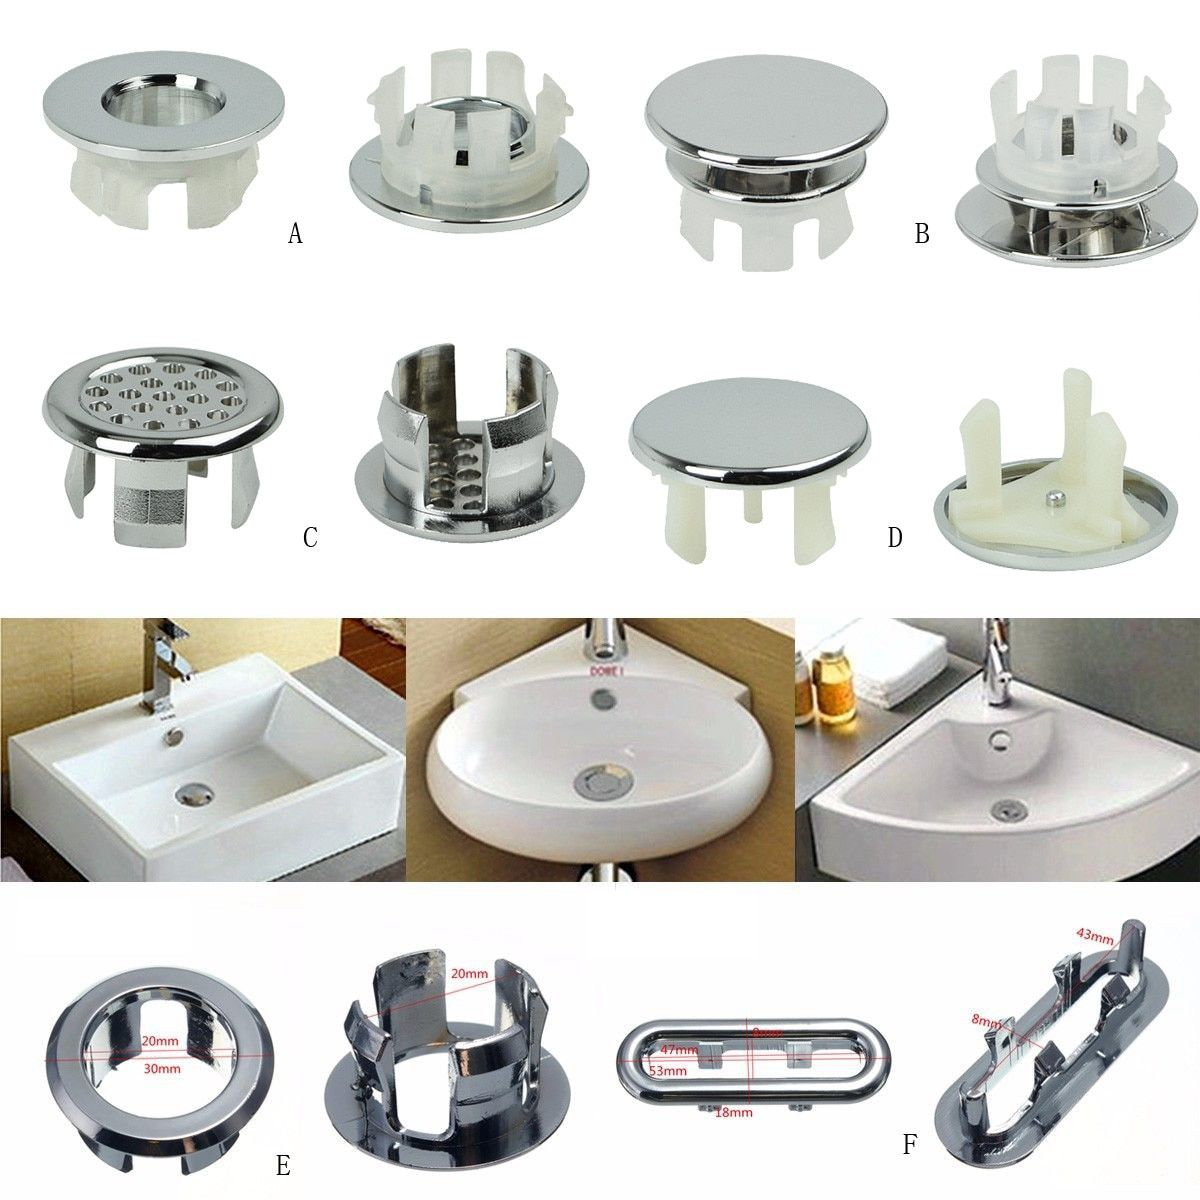 1pcs Sink Hole Round Overflow Cover Ceramic Pots Basin Sink